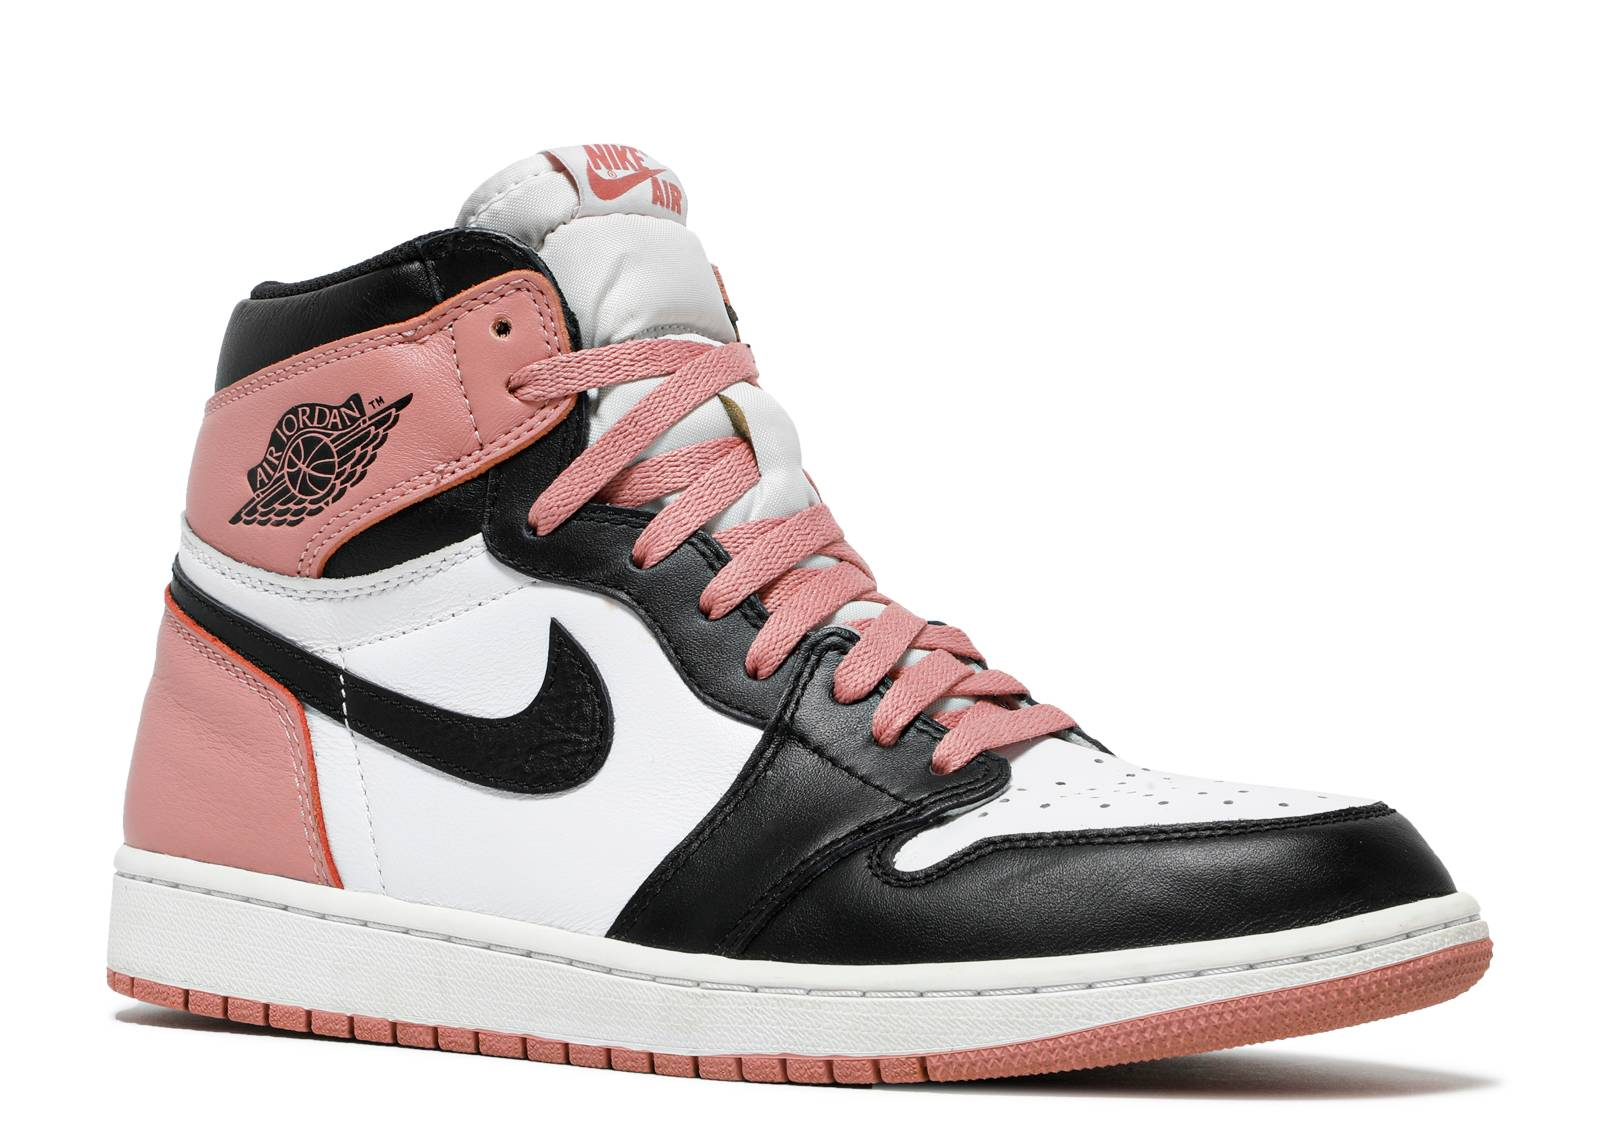 nice shoes cozy fresh hot product air jordan 1 retro high og nrg